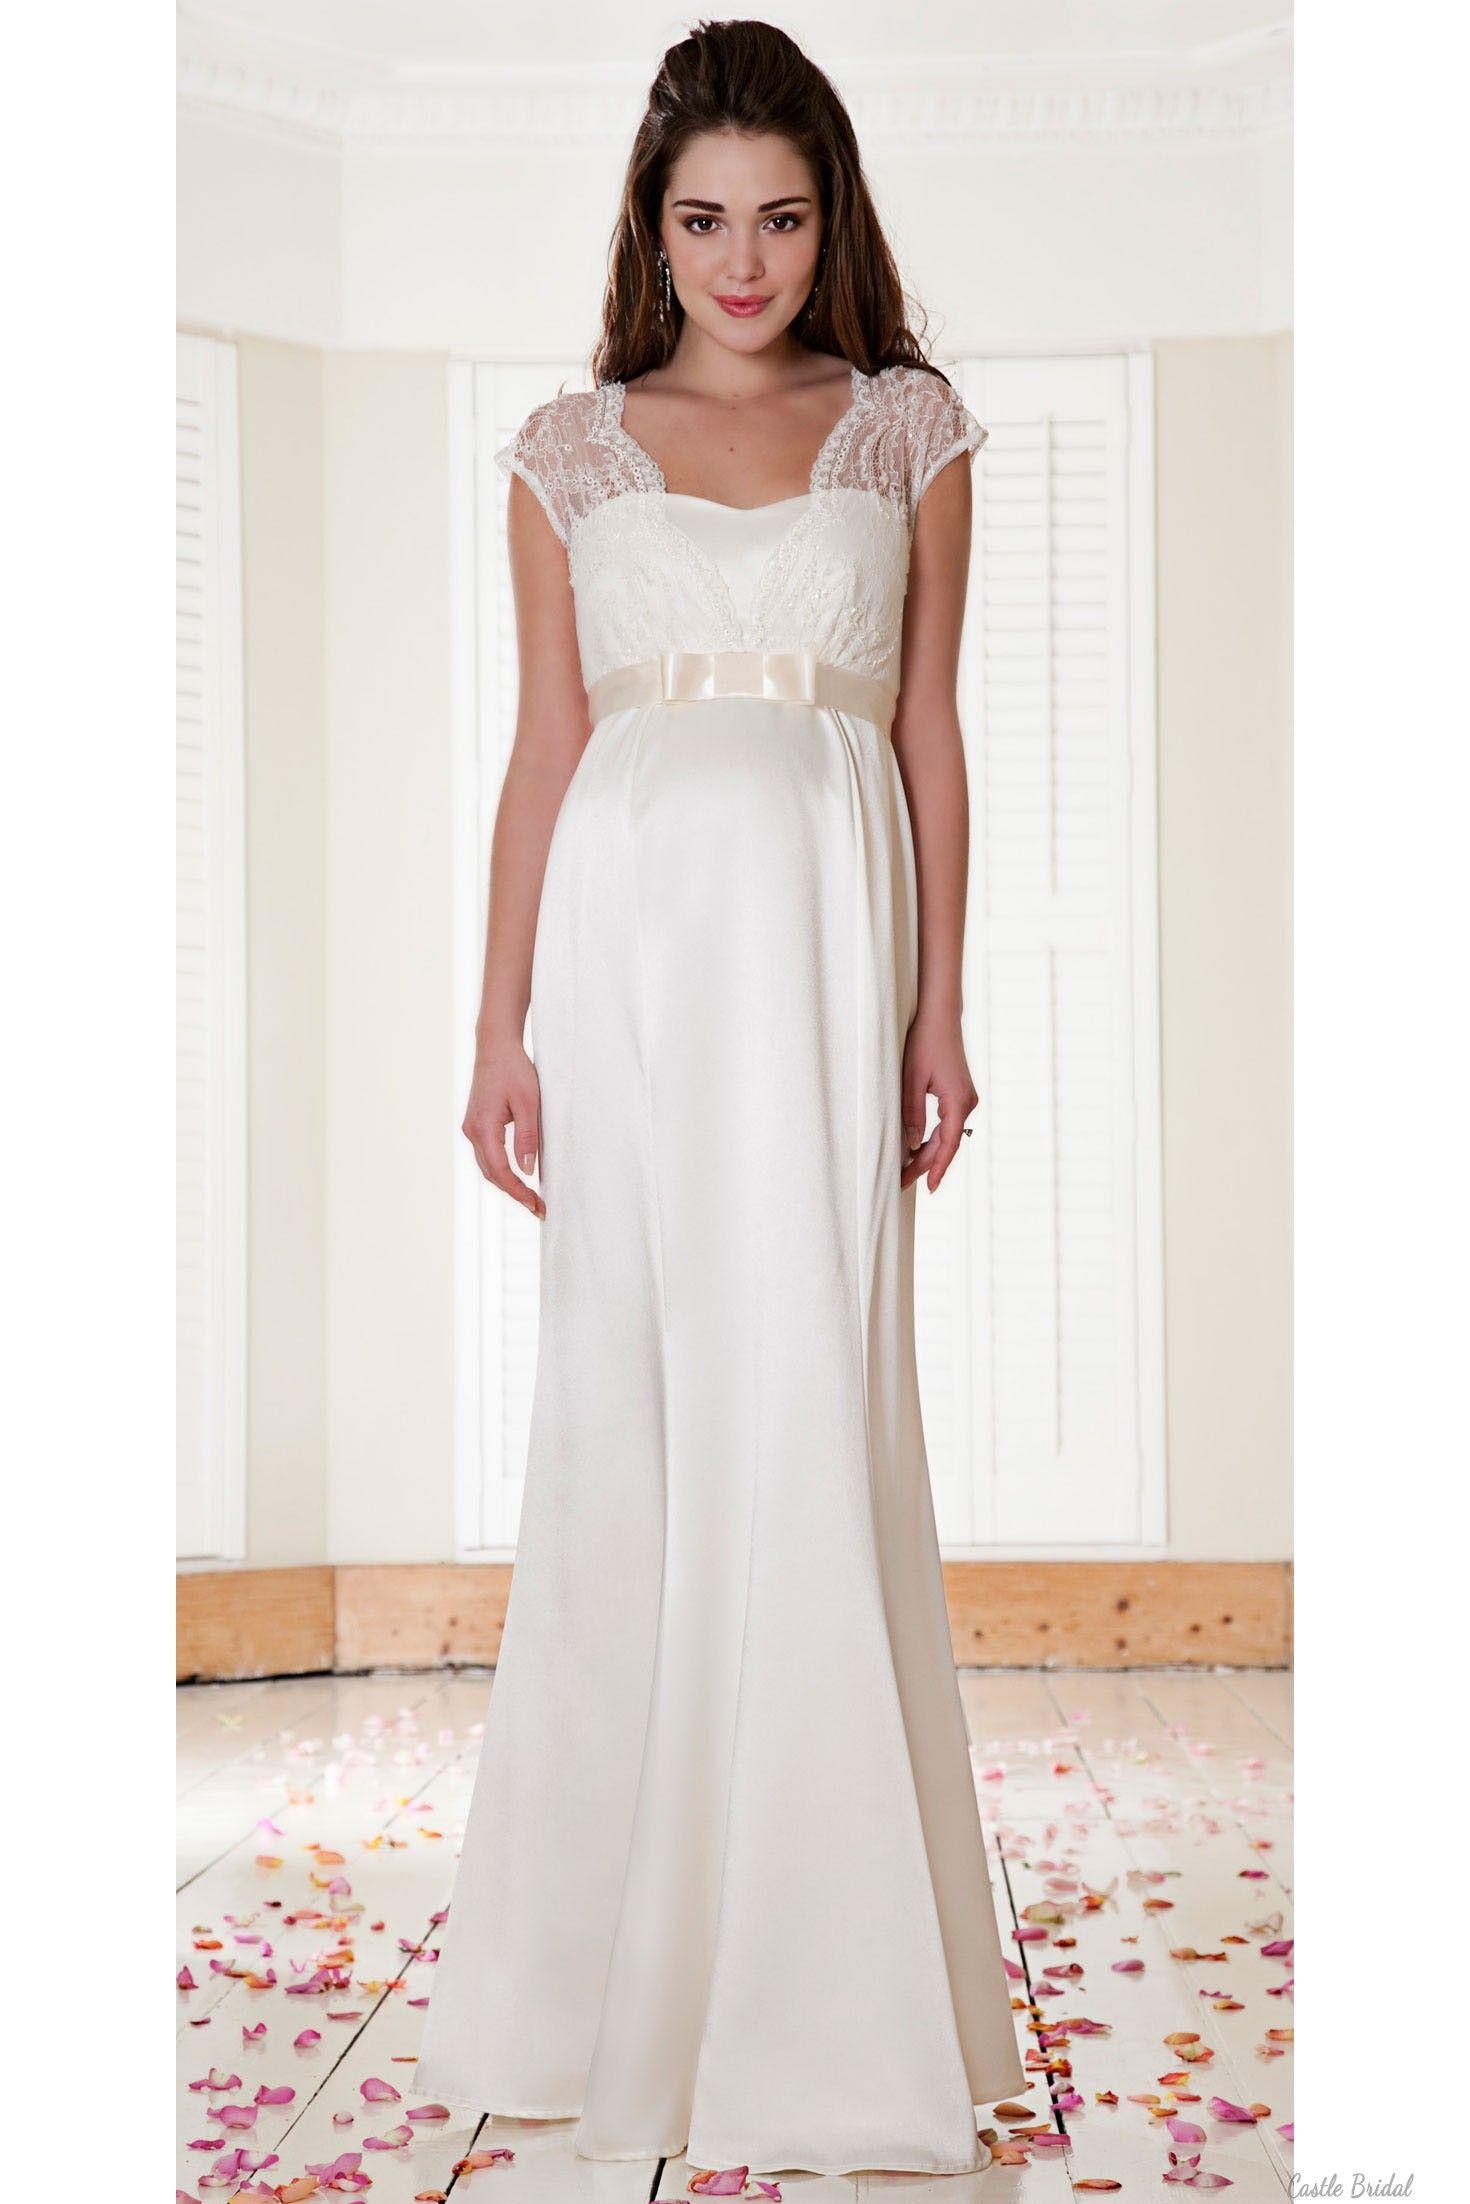 Romantic Lace And Satin Long Mermaid Maternity Wedding Dress | We\'re ...